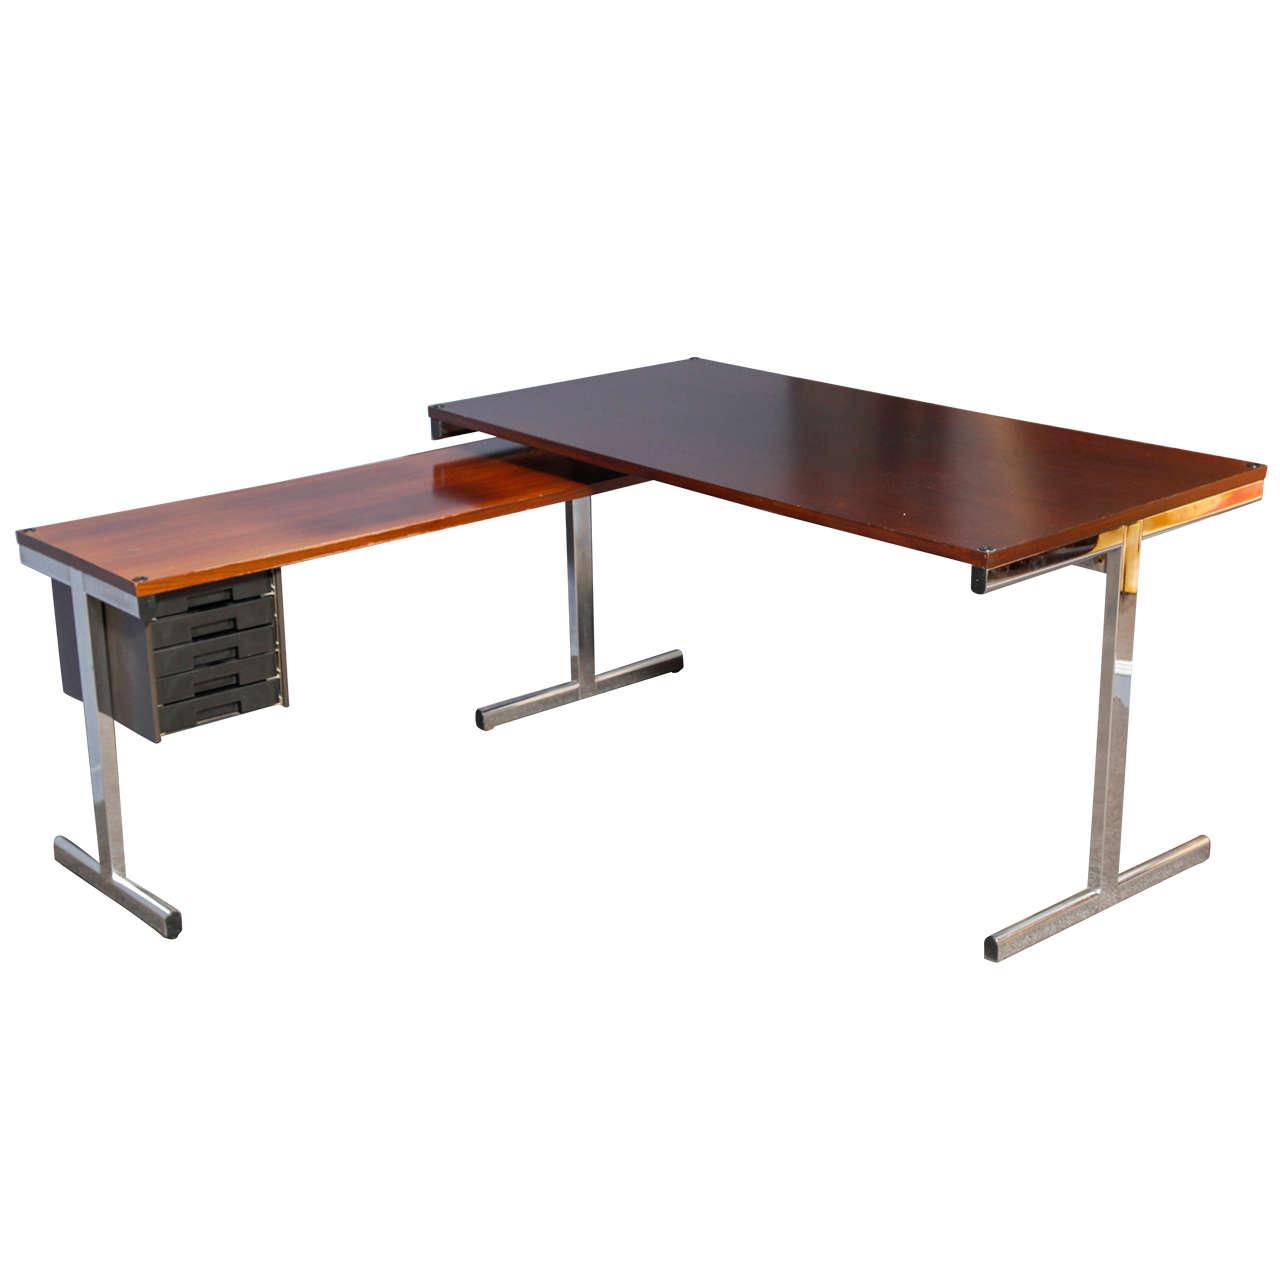 executive desk from mim mobili italiani moderni modernism